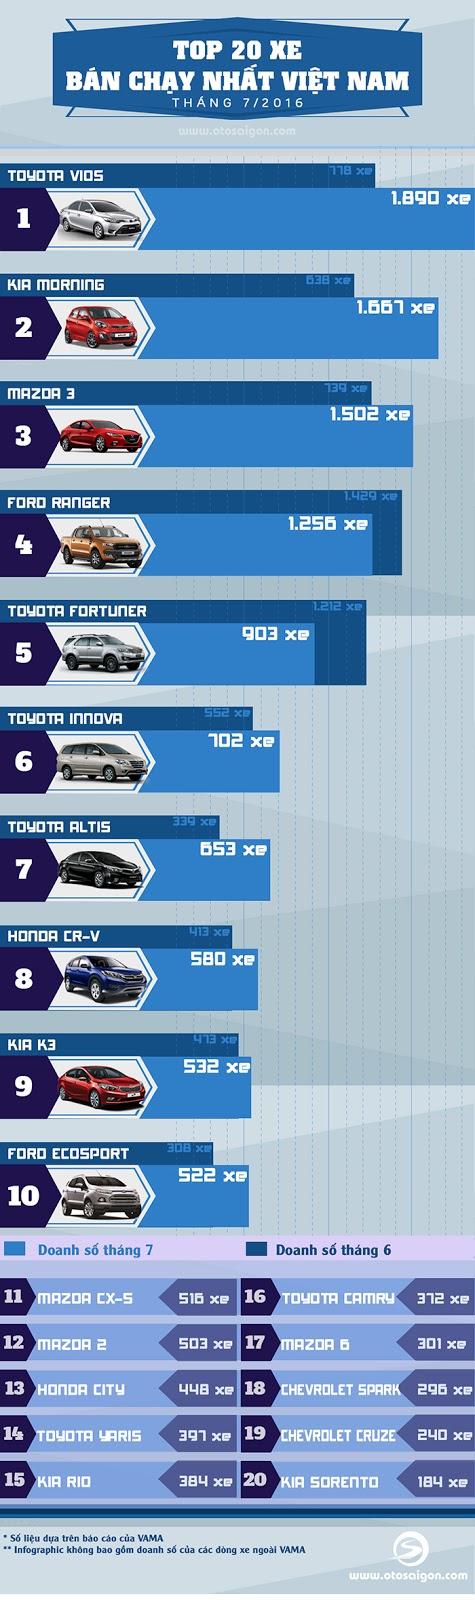 top 10 xe ban chay nhat viet nam trong thang 07